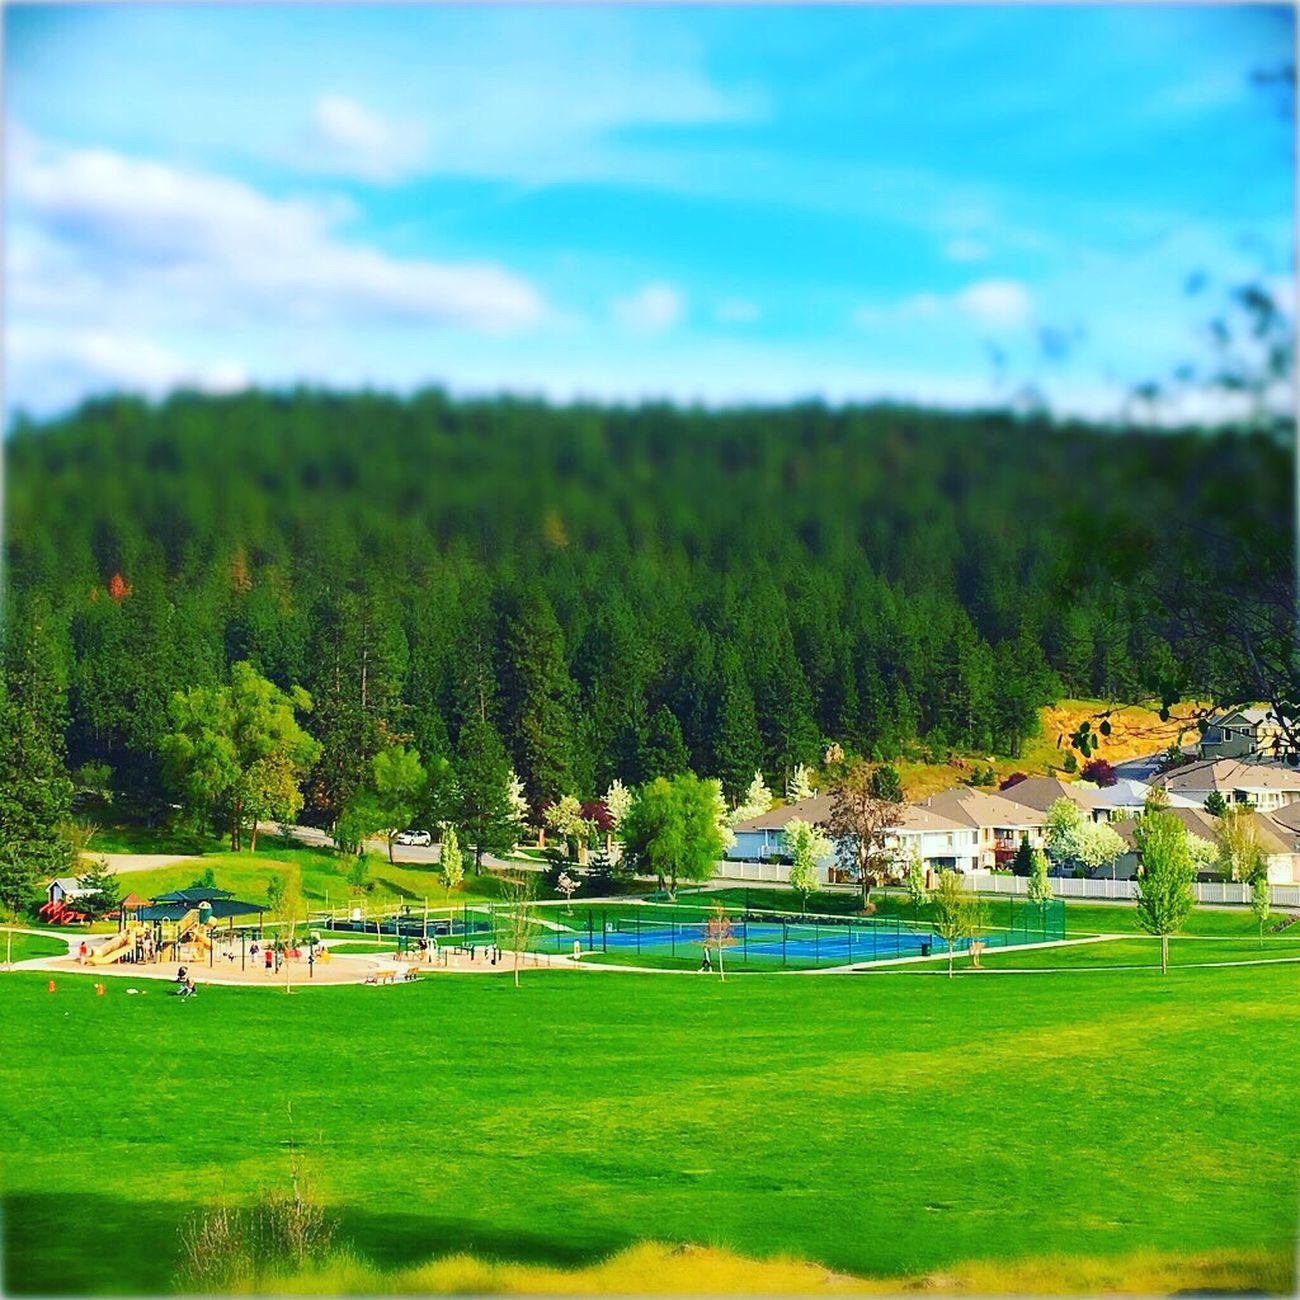 Sky Landscape Outdoors Nature Washington State Spokane Pacific Northwest  Park PNW Spokane Wa Spokane Valley Inlandempire First Eyeem Photo